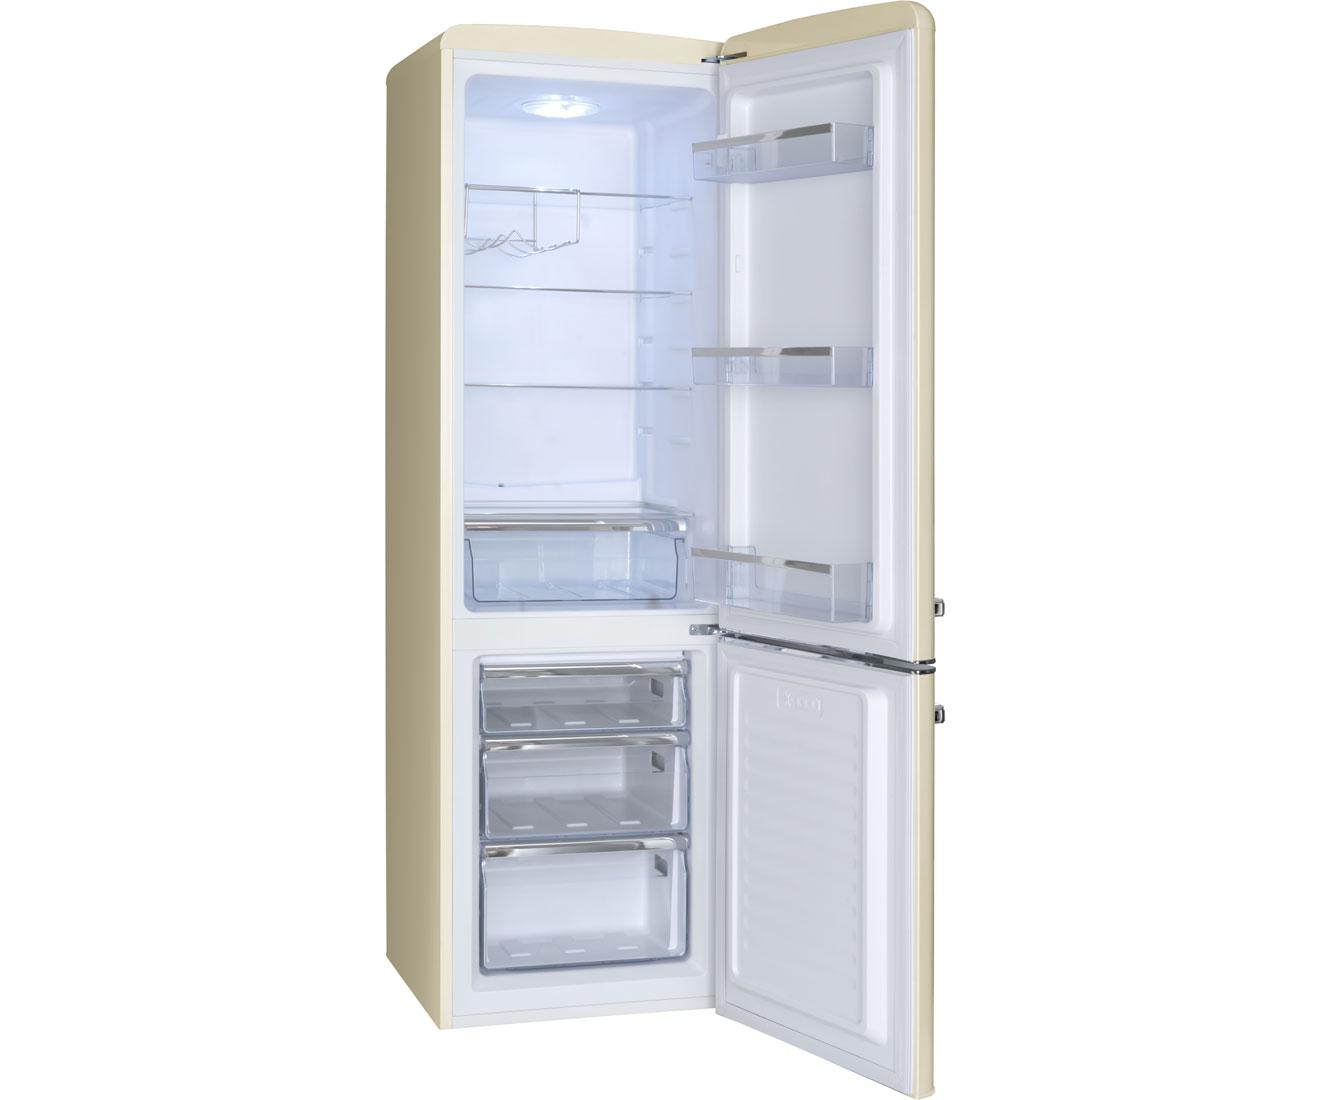 Amica Kühlschrank Hellblau : Amica kgcr l kühl gefrierkombination er breite